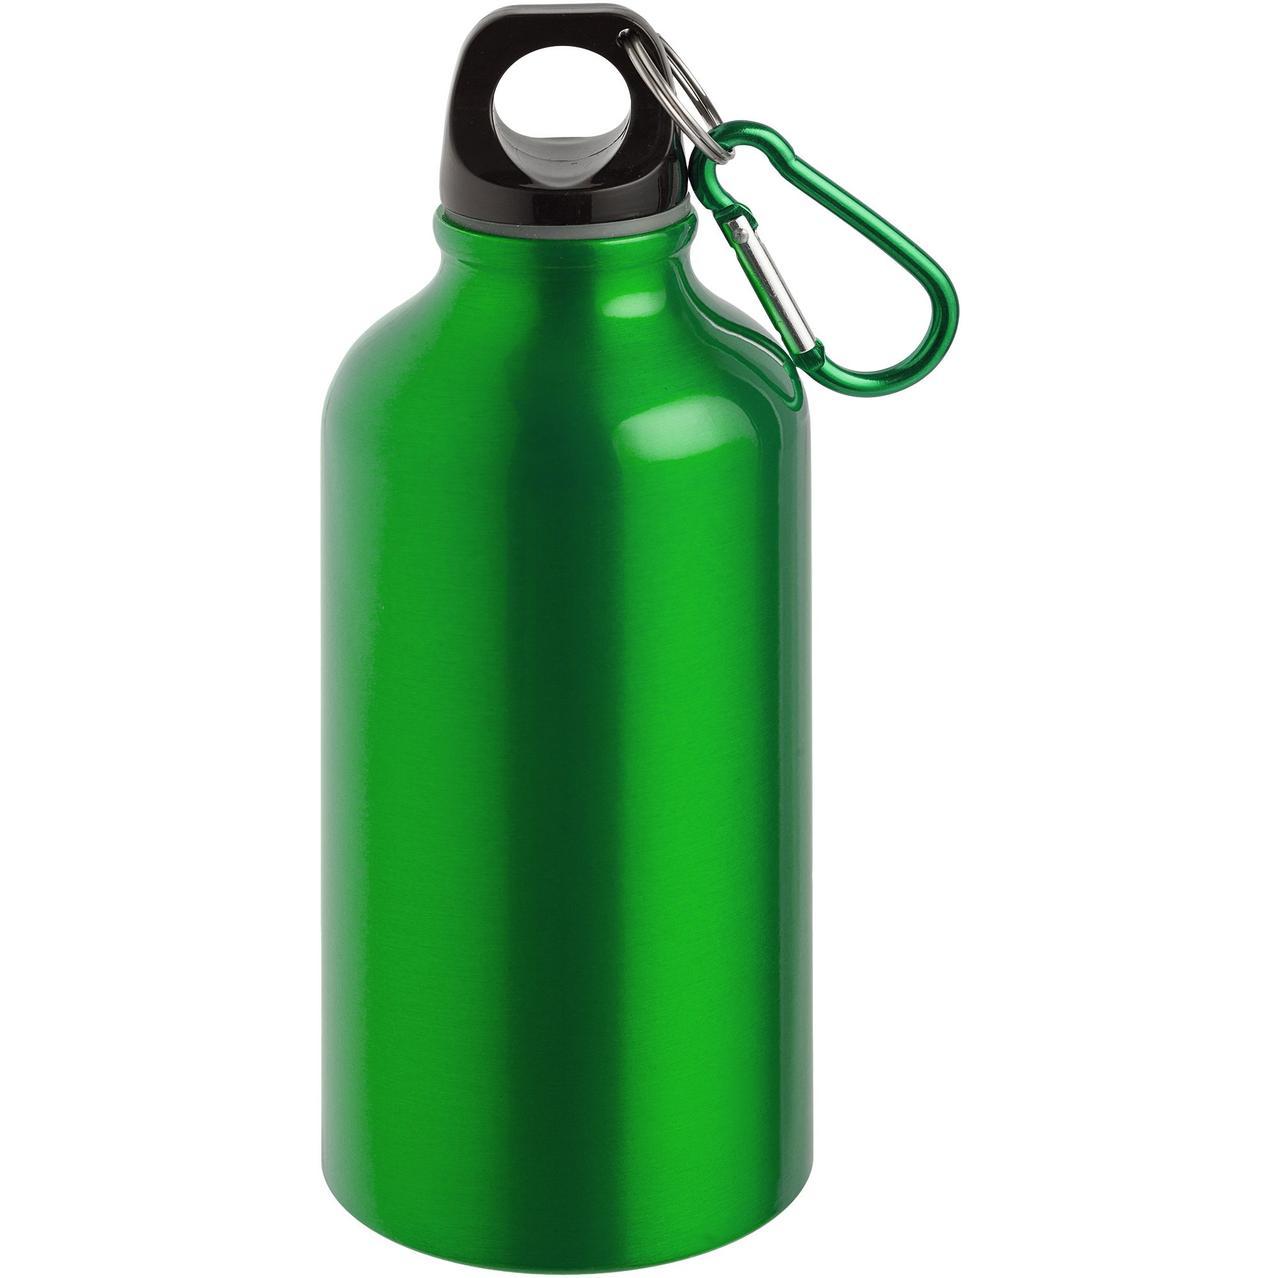 Бутылка для спорта Re-Source, зеленая (артикул 7504.90)